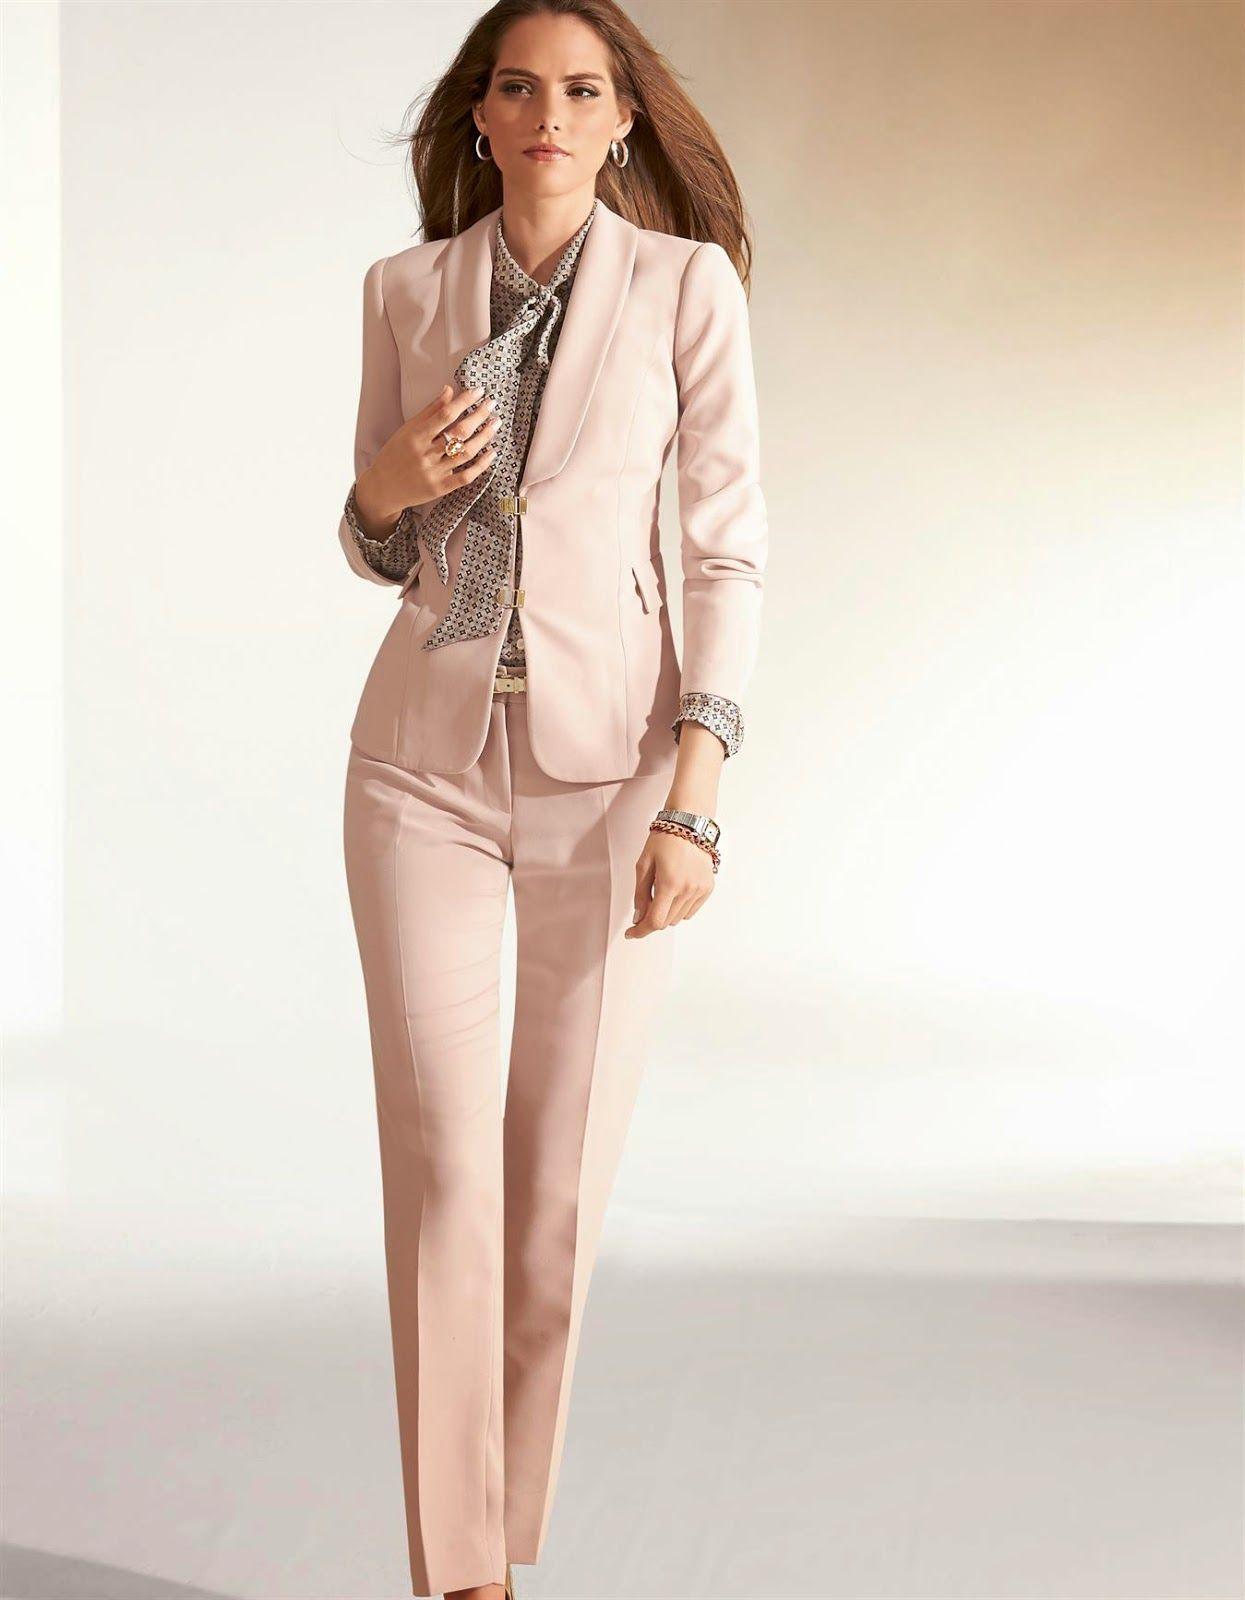 Traje de pantalon y chaqueta formal dama